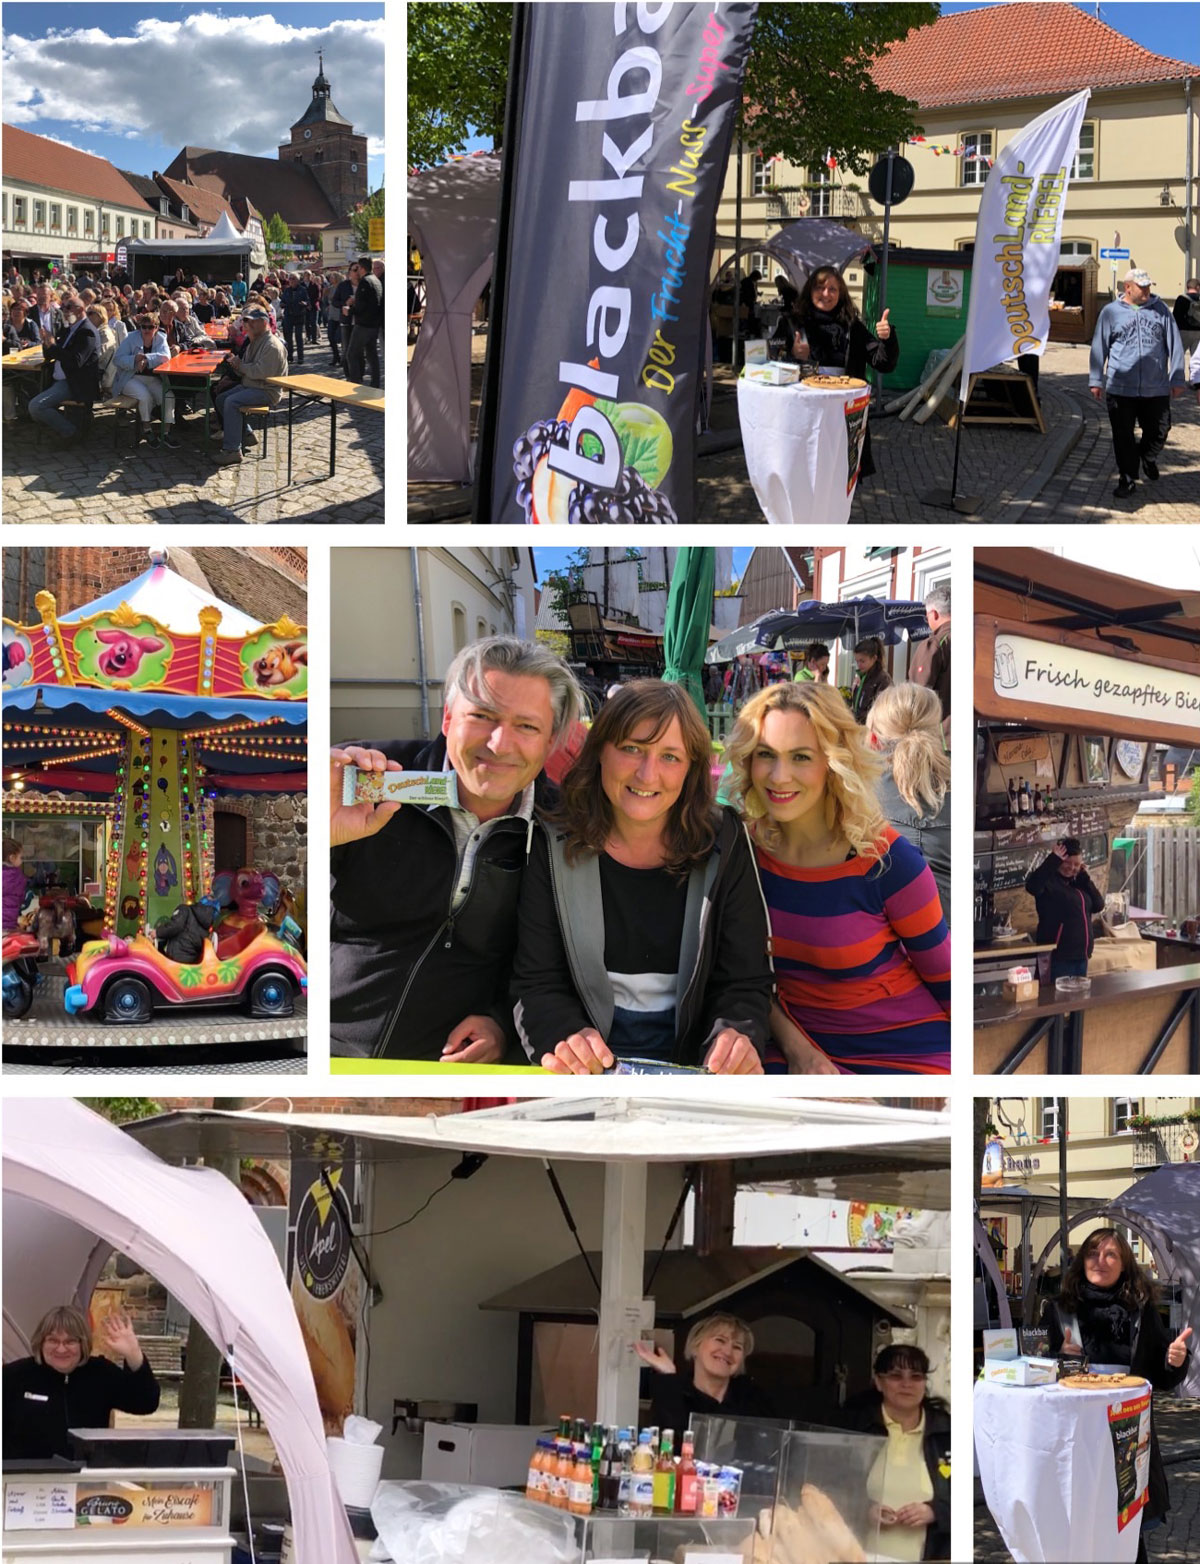 Stadtfest Osterburg, Fest, Feiern, EDEKA Apel, Karina Klüber